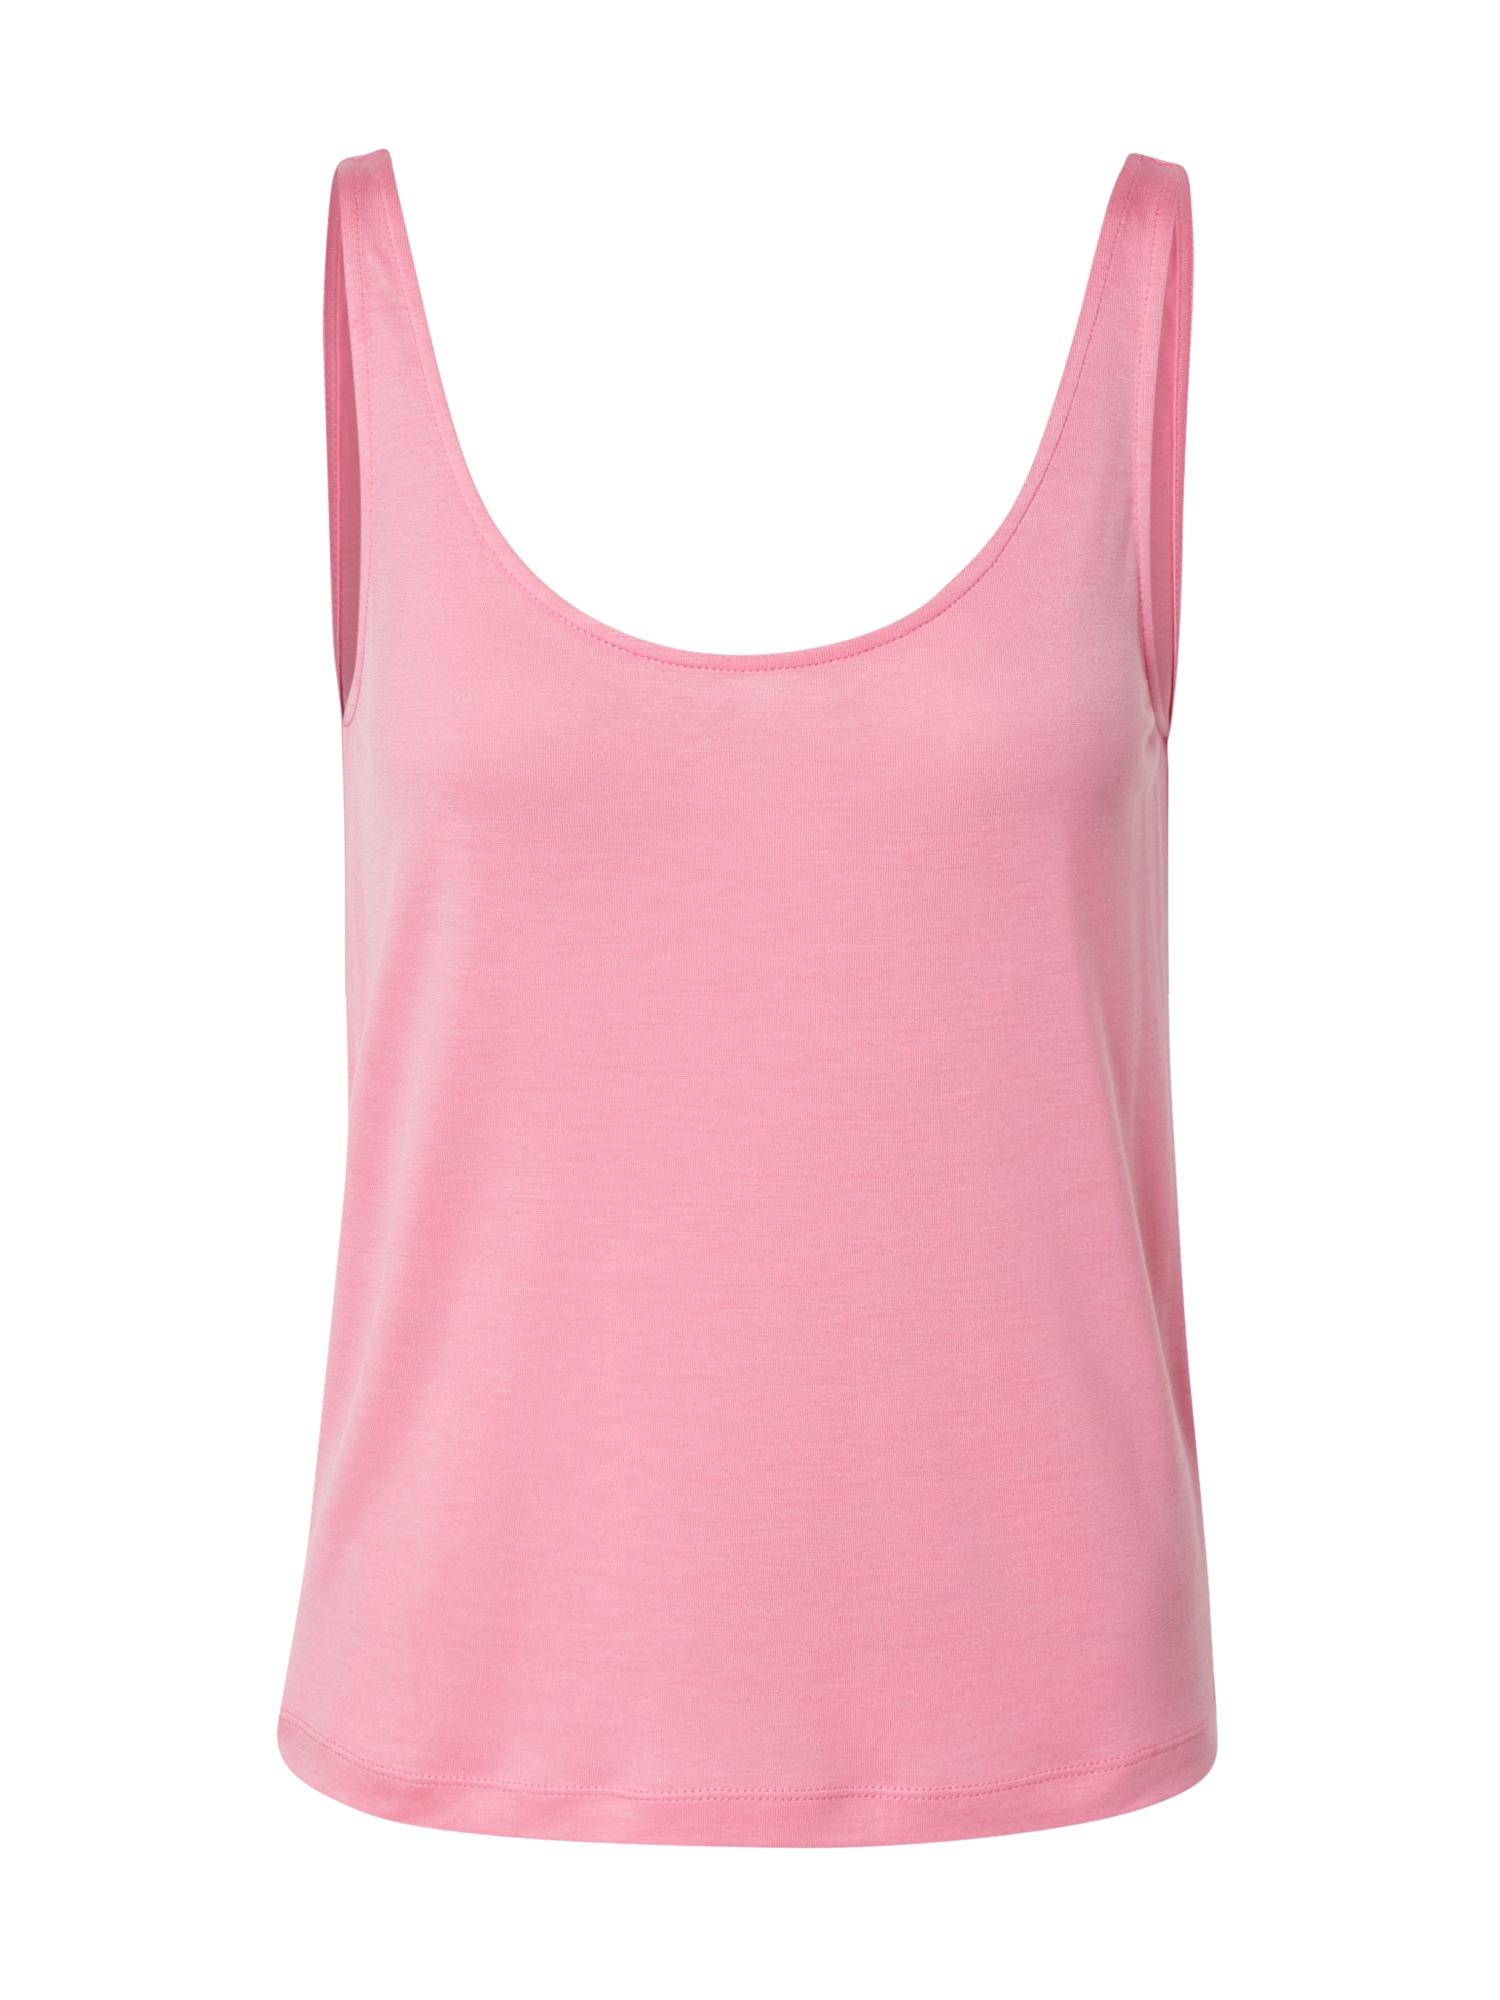 EDITED Top 'Gleni'  pink